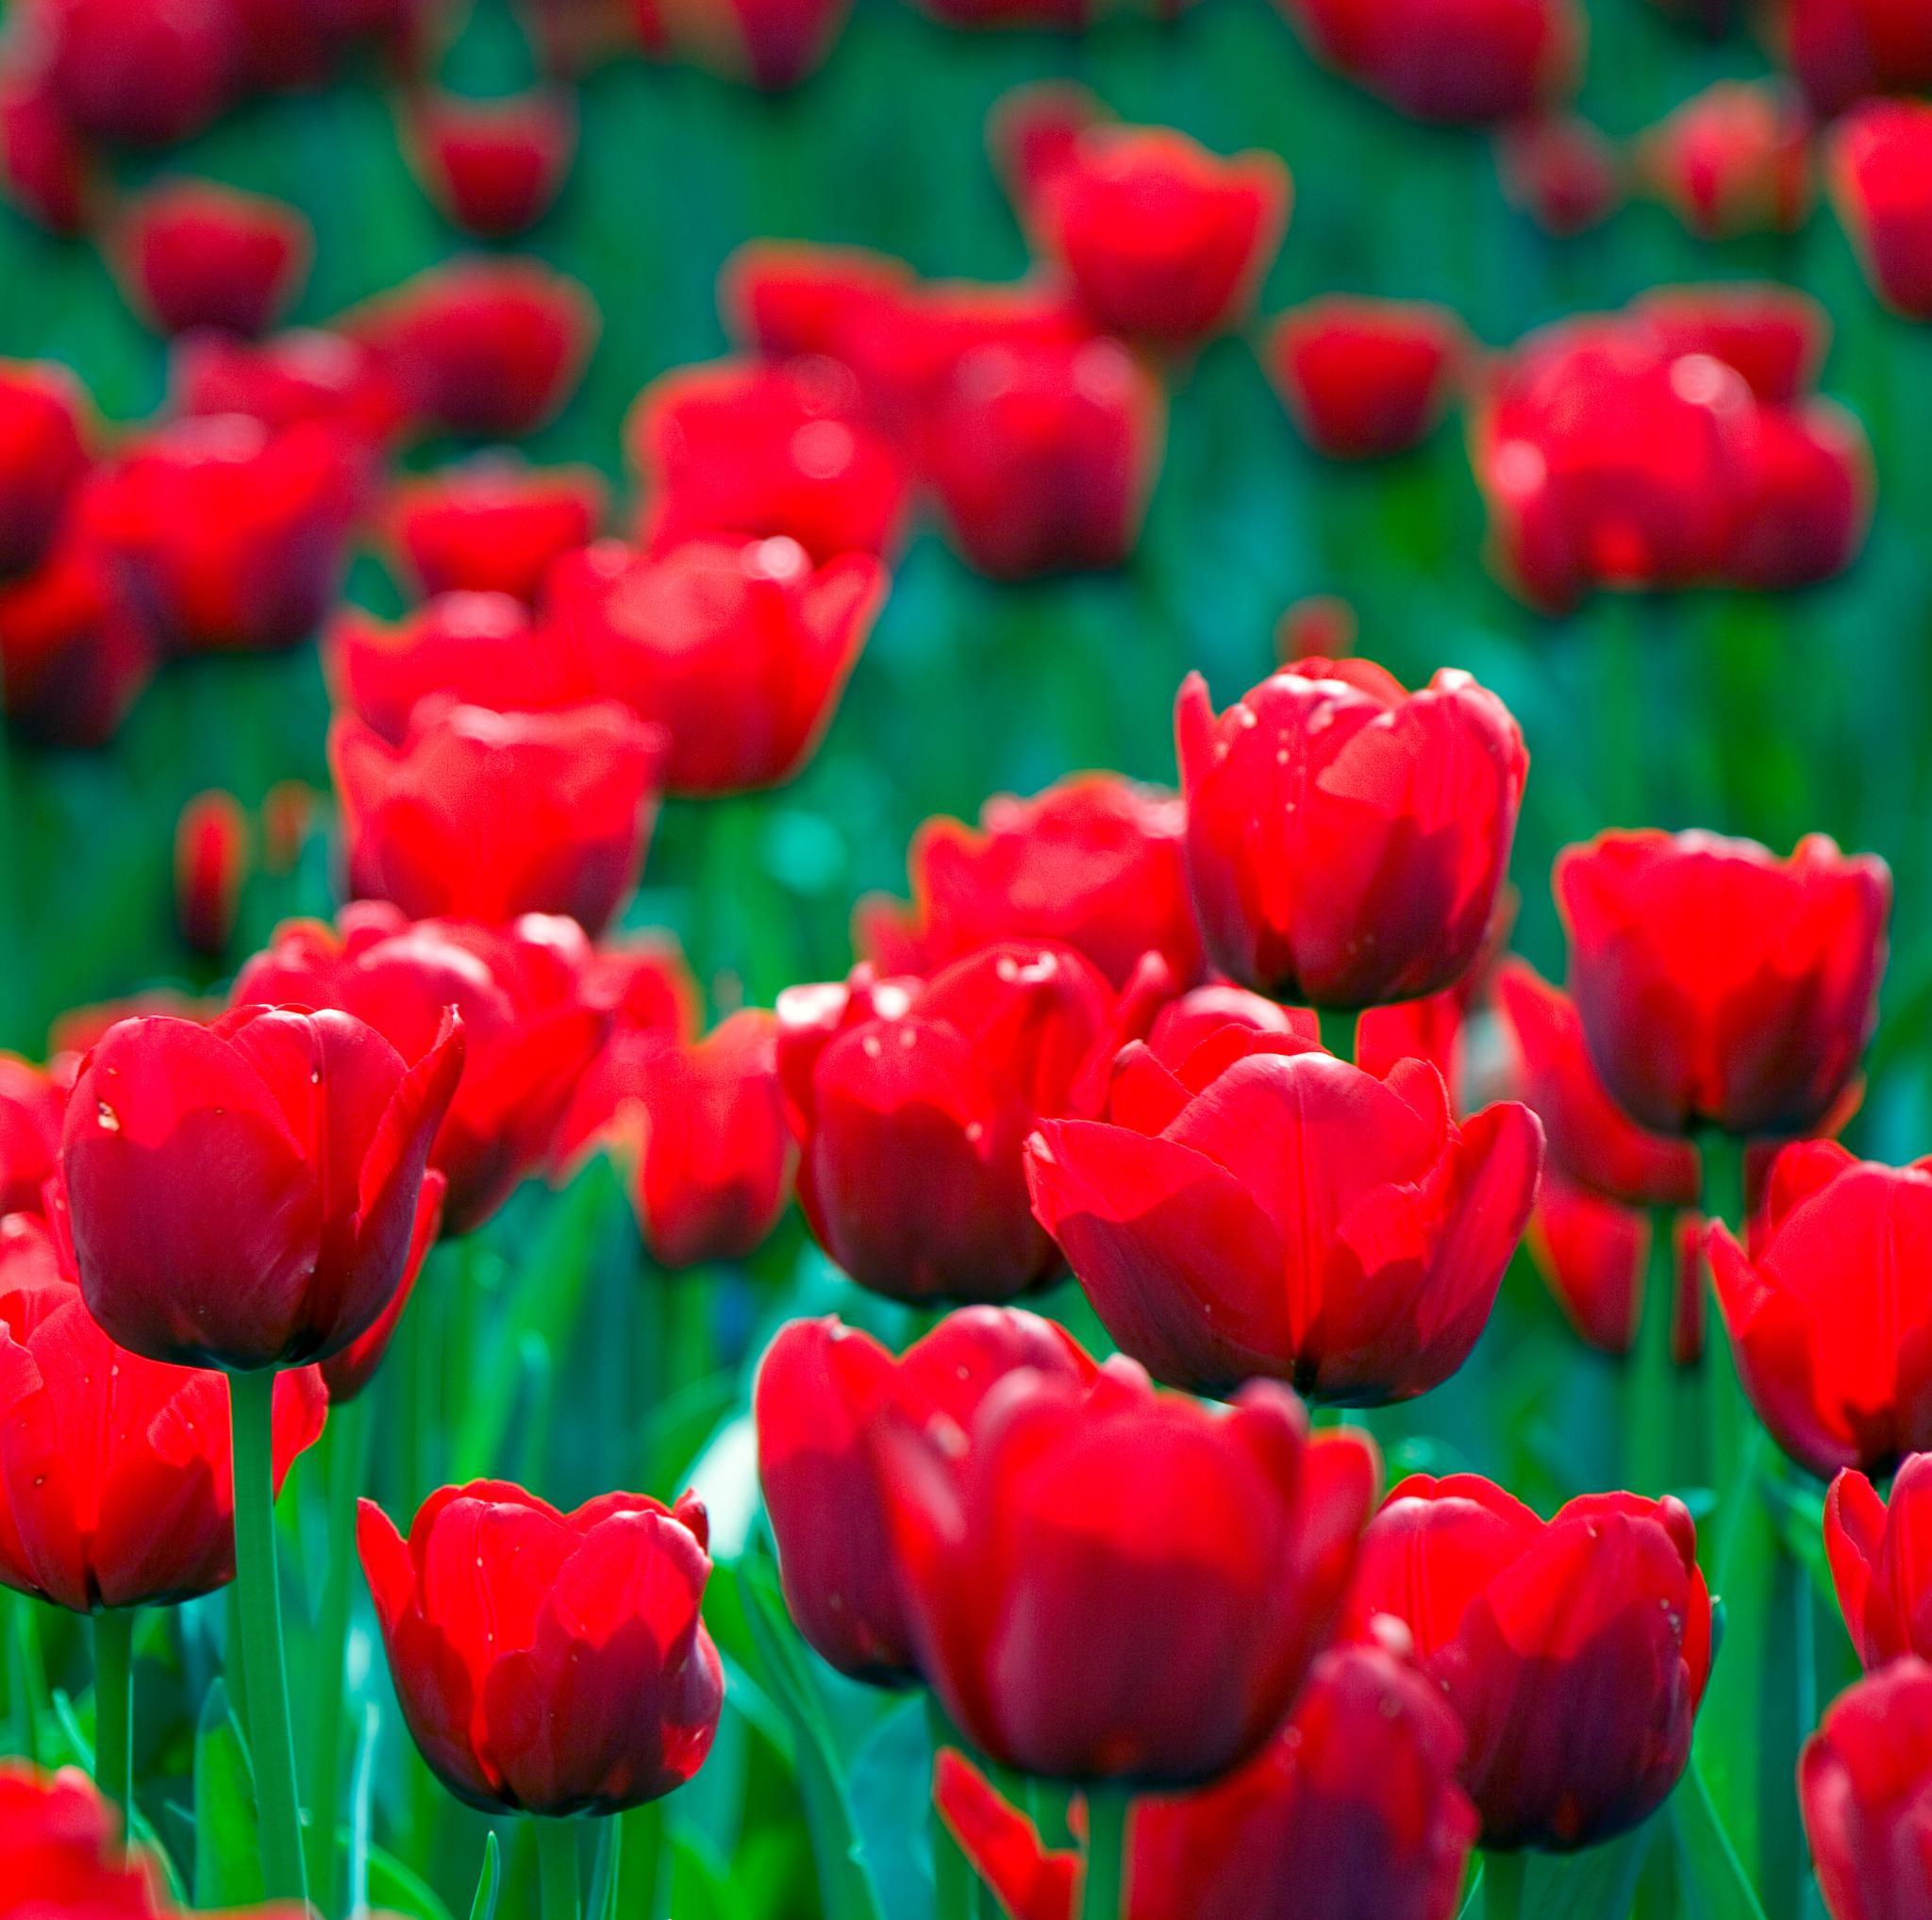 Tulips - 017 by Ozroo